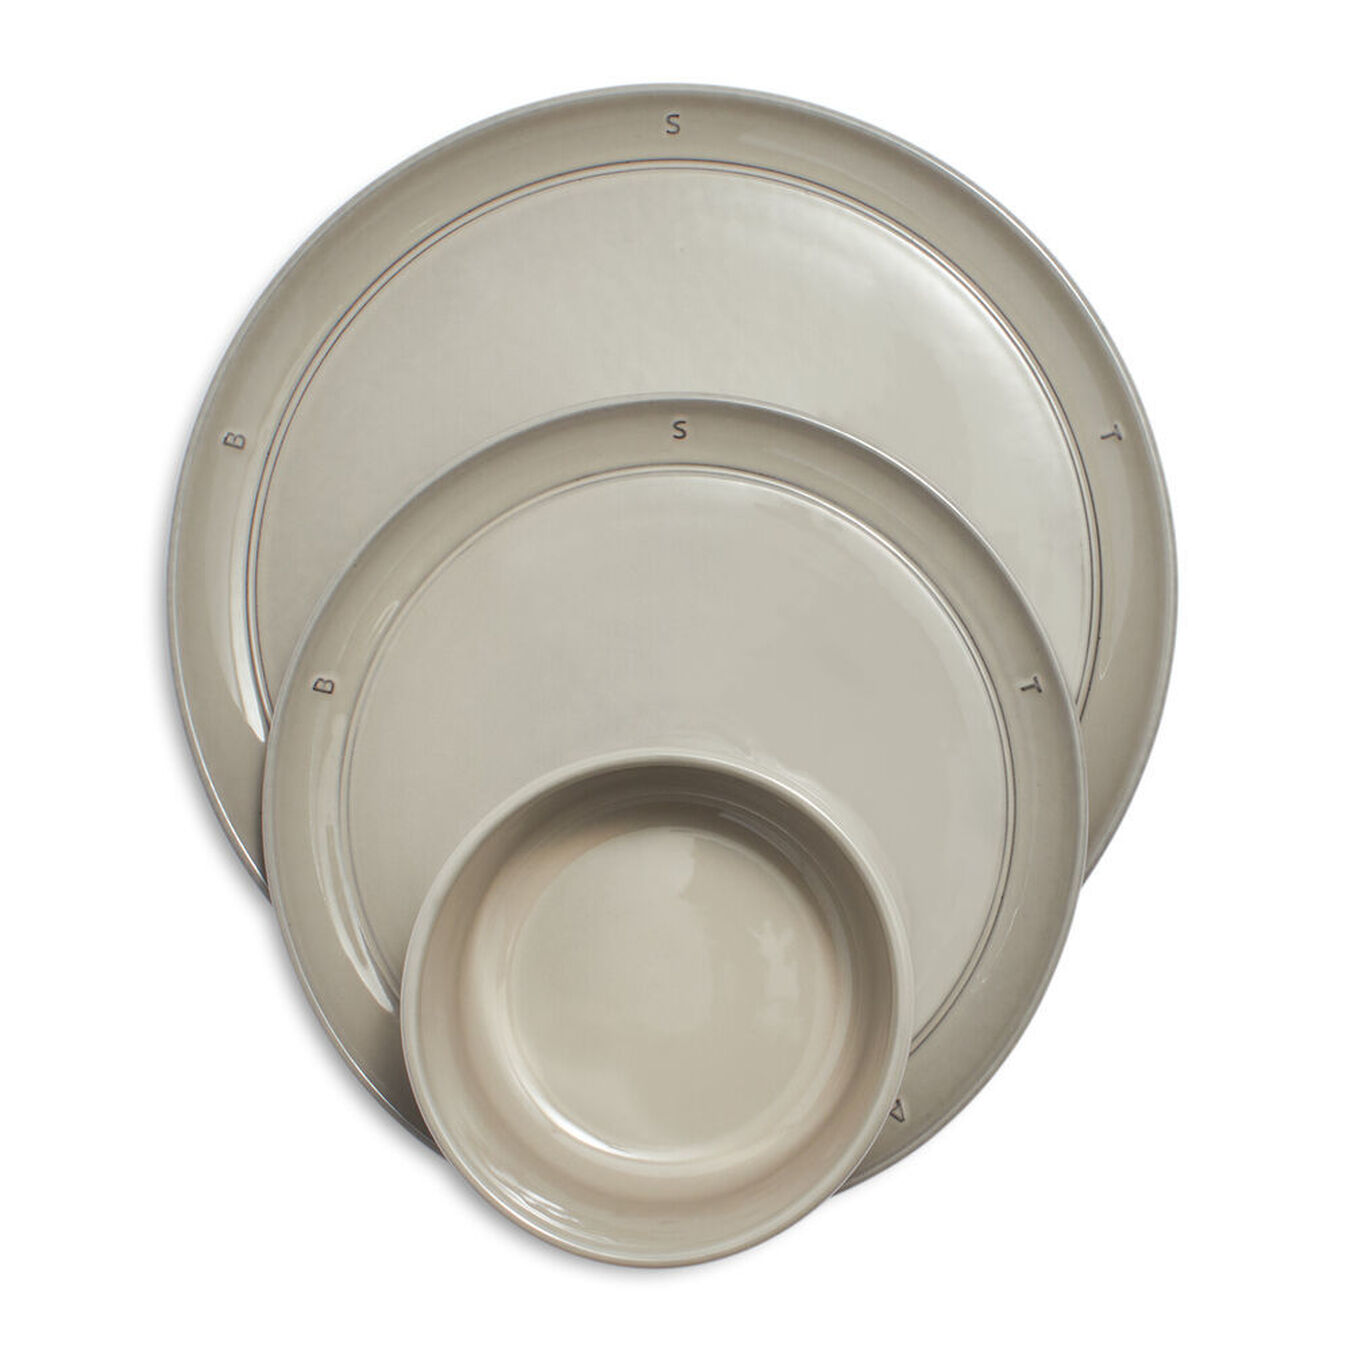 12-pc Dinnerware Set,,large 1